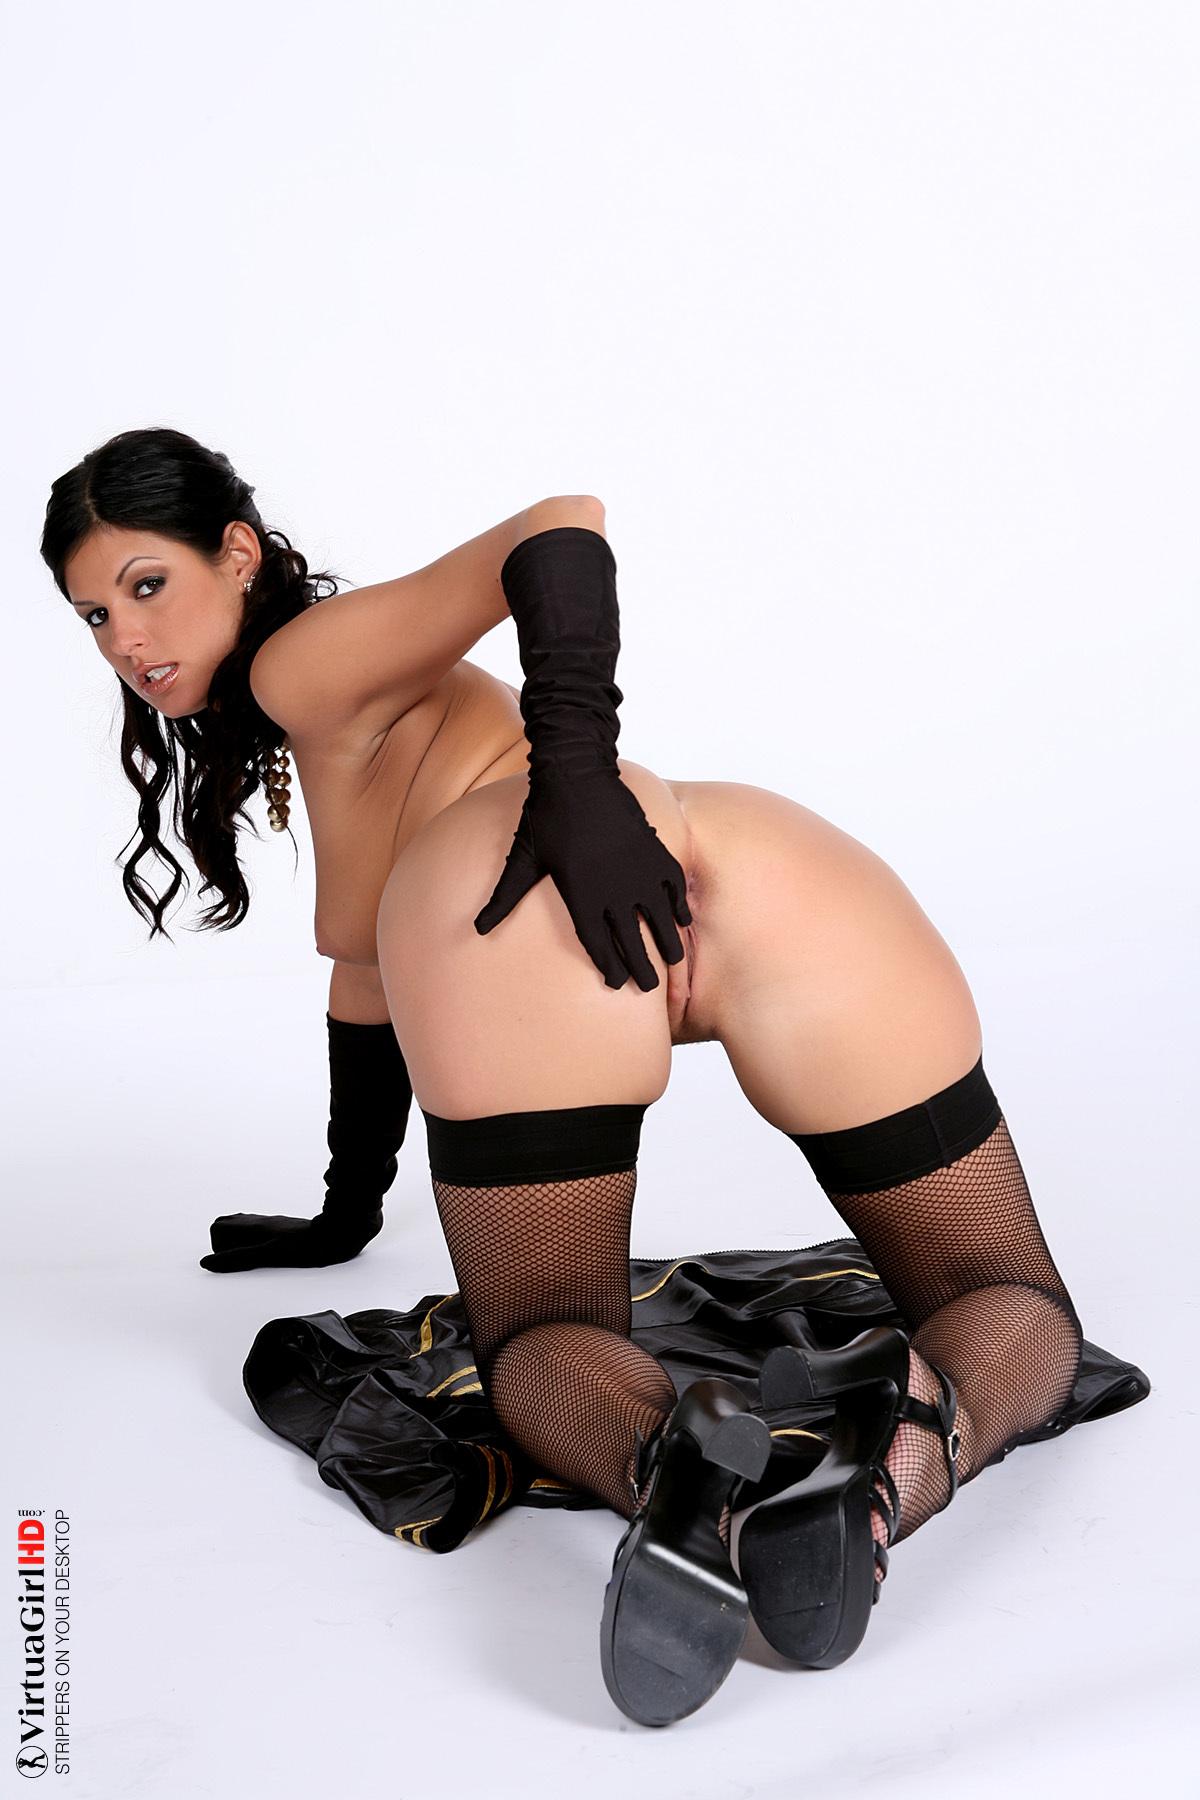 girls stripping fully naked